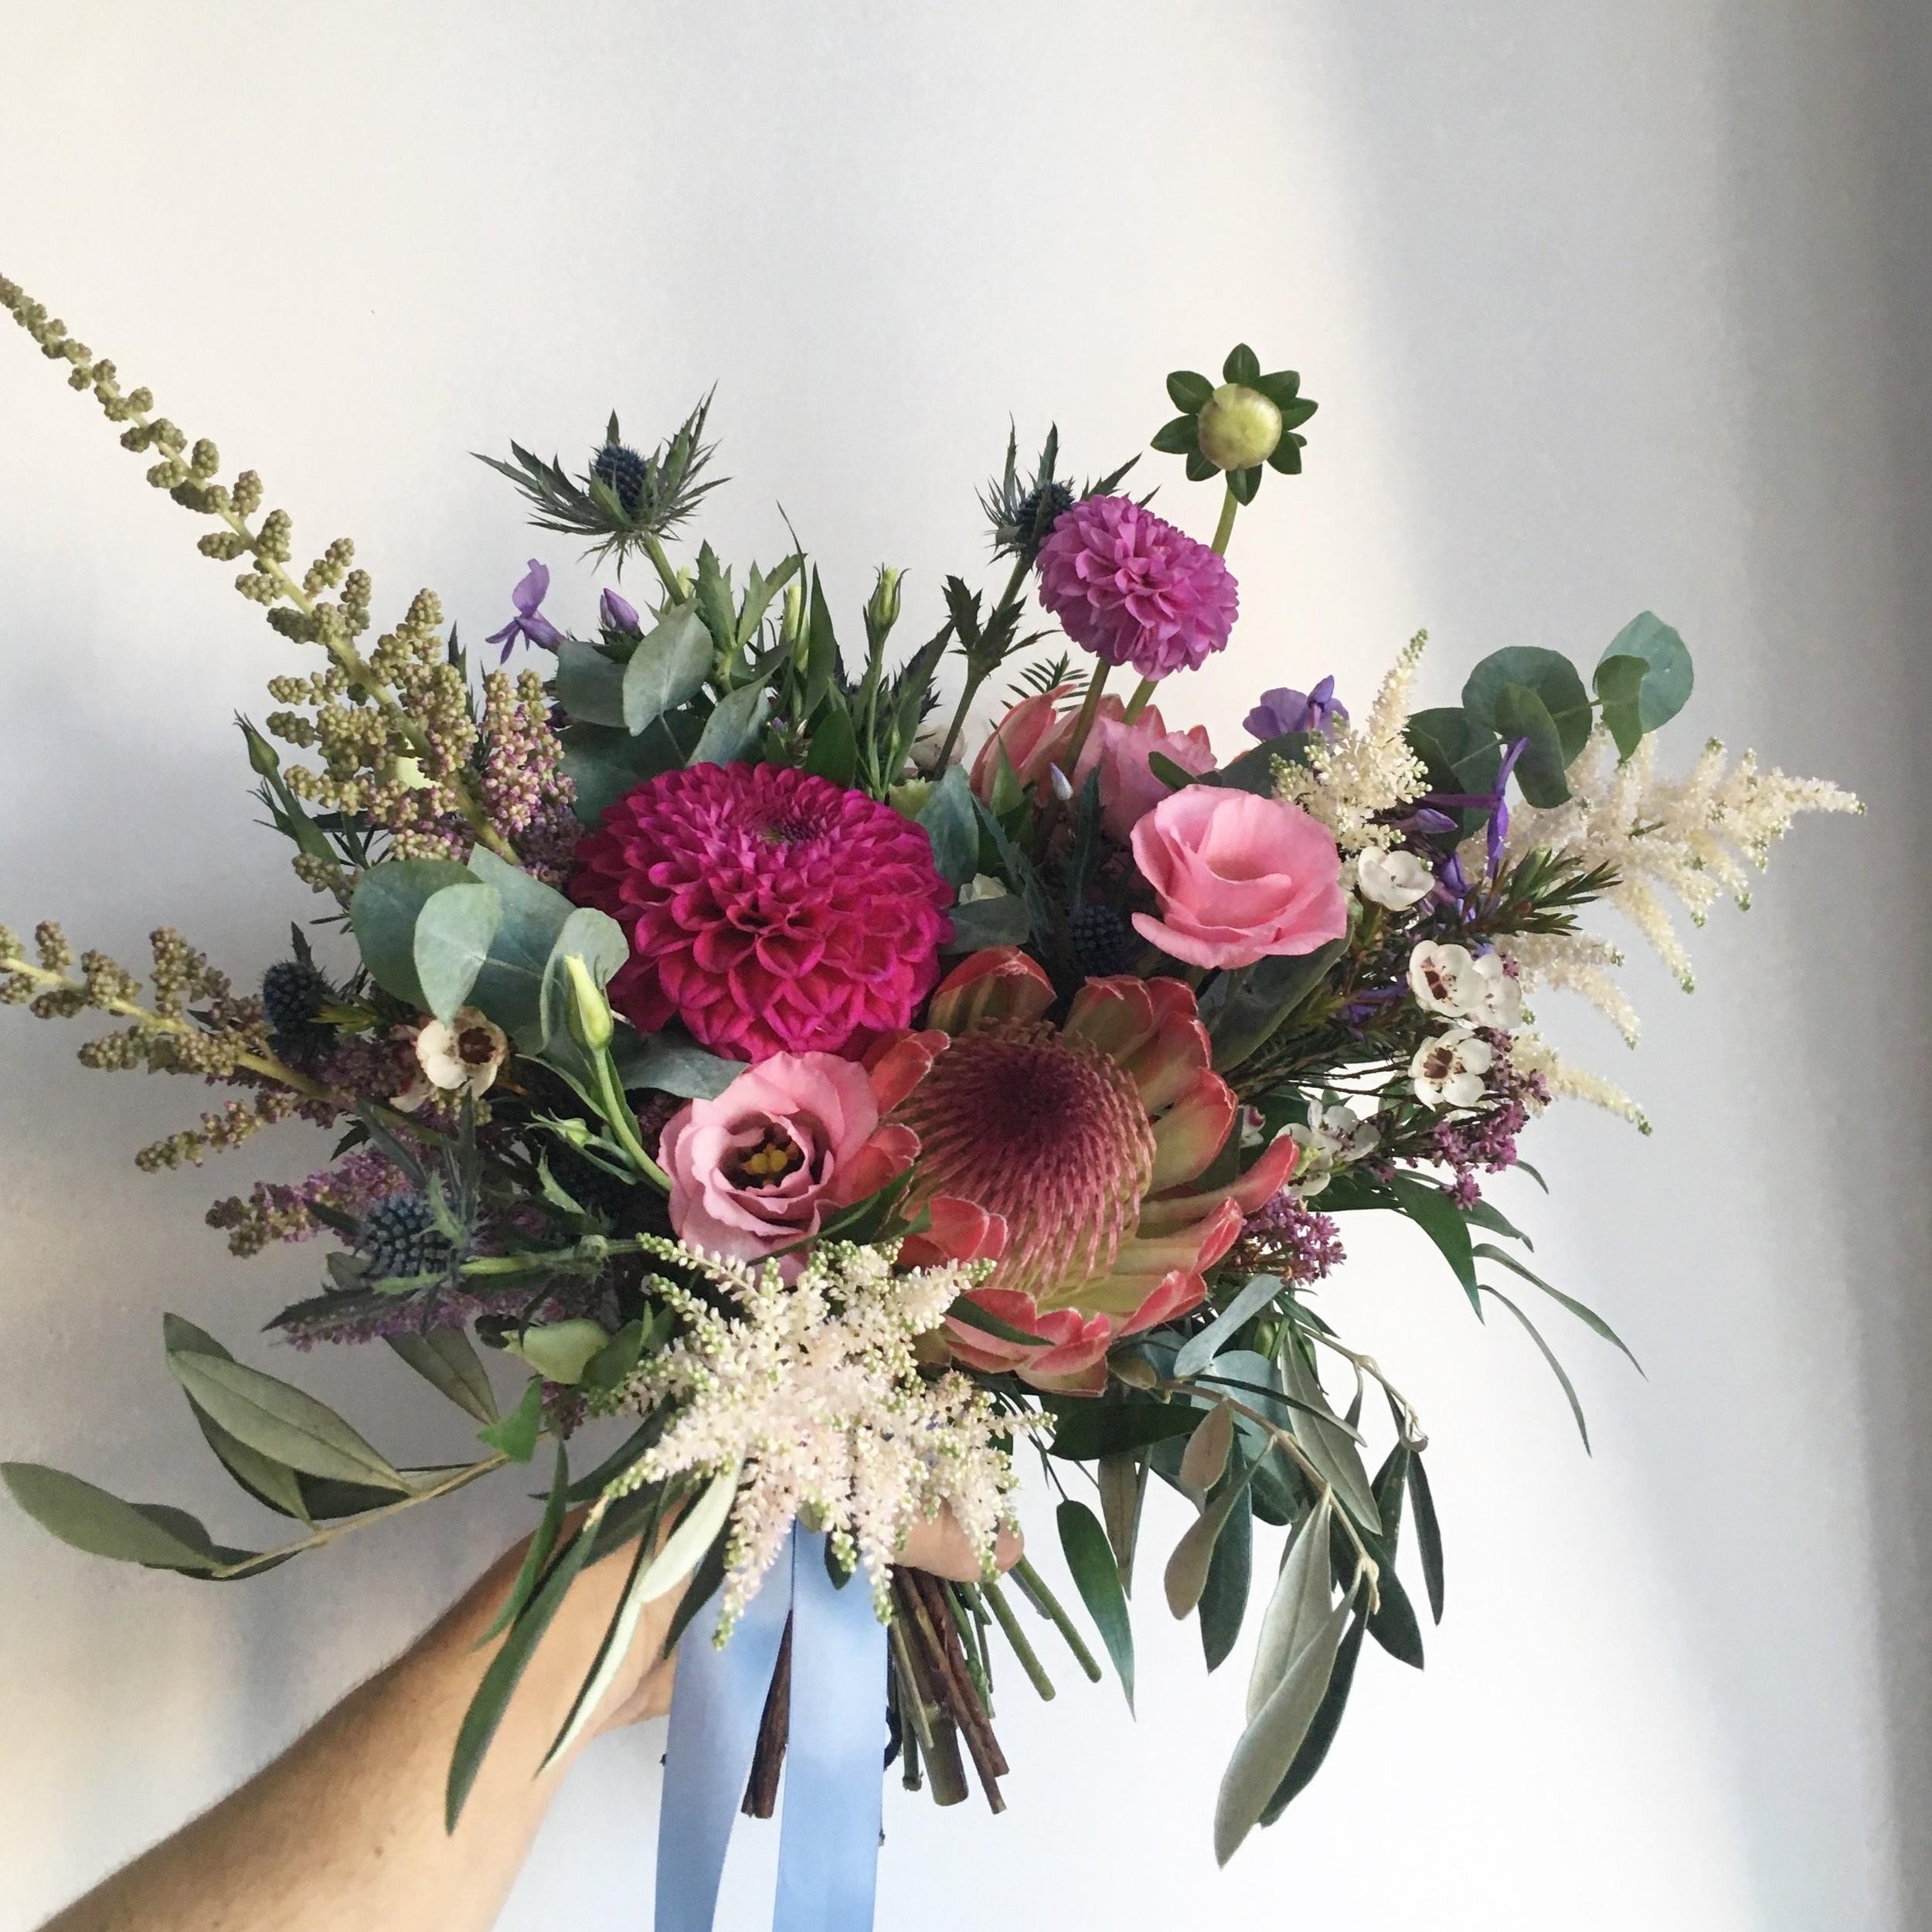 Wedding-Flowers-Brighton-Sussex-Florist-Bridal-Webb-and-Farrer+%288%29.jpg